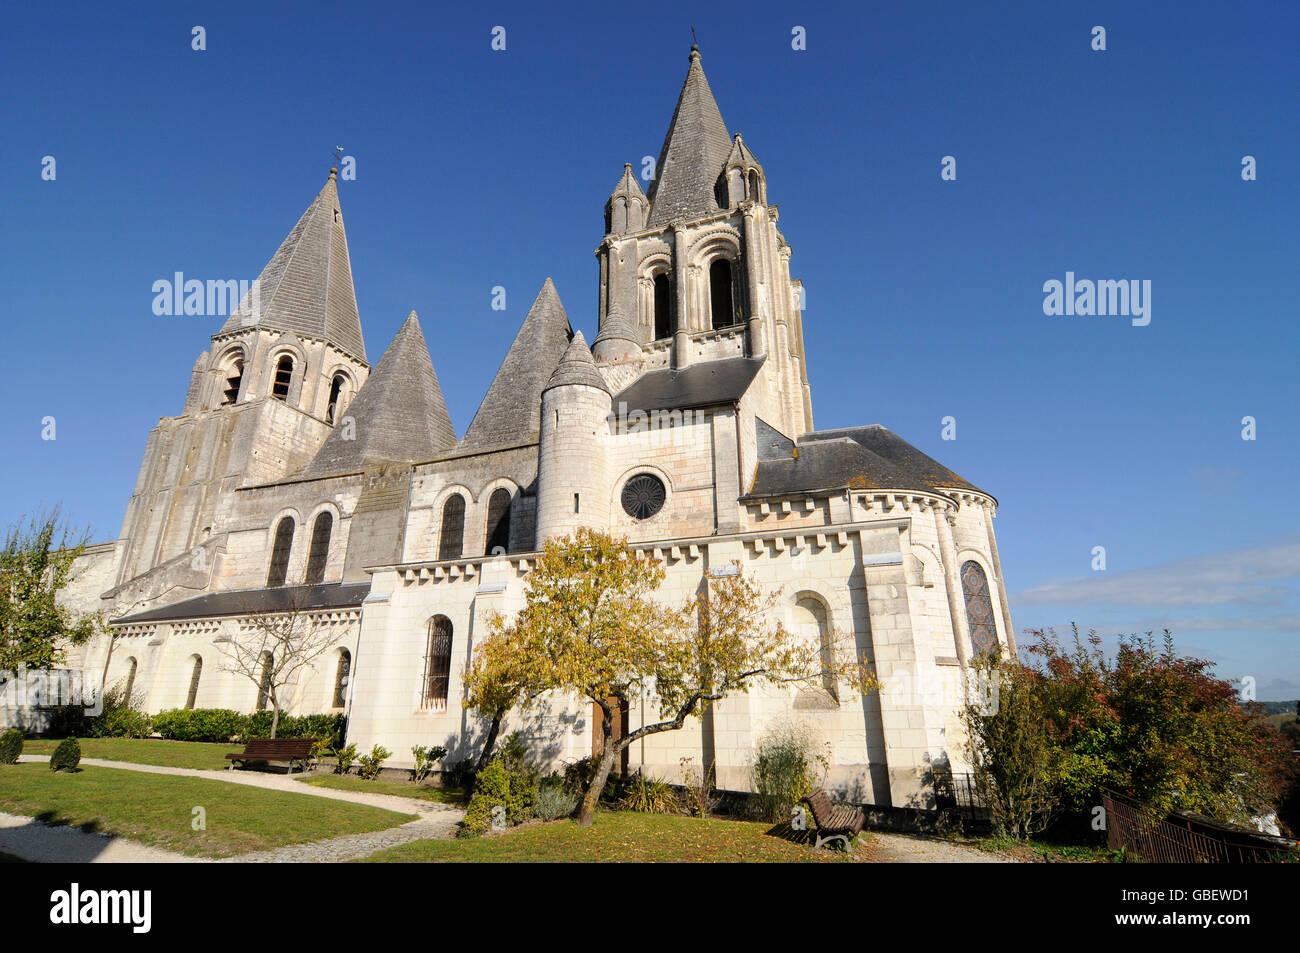 Loches, Loches, Tours, Indre-et-Loire, Centre, France Photo Stock